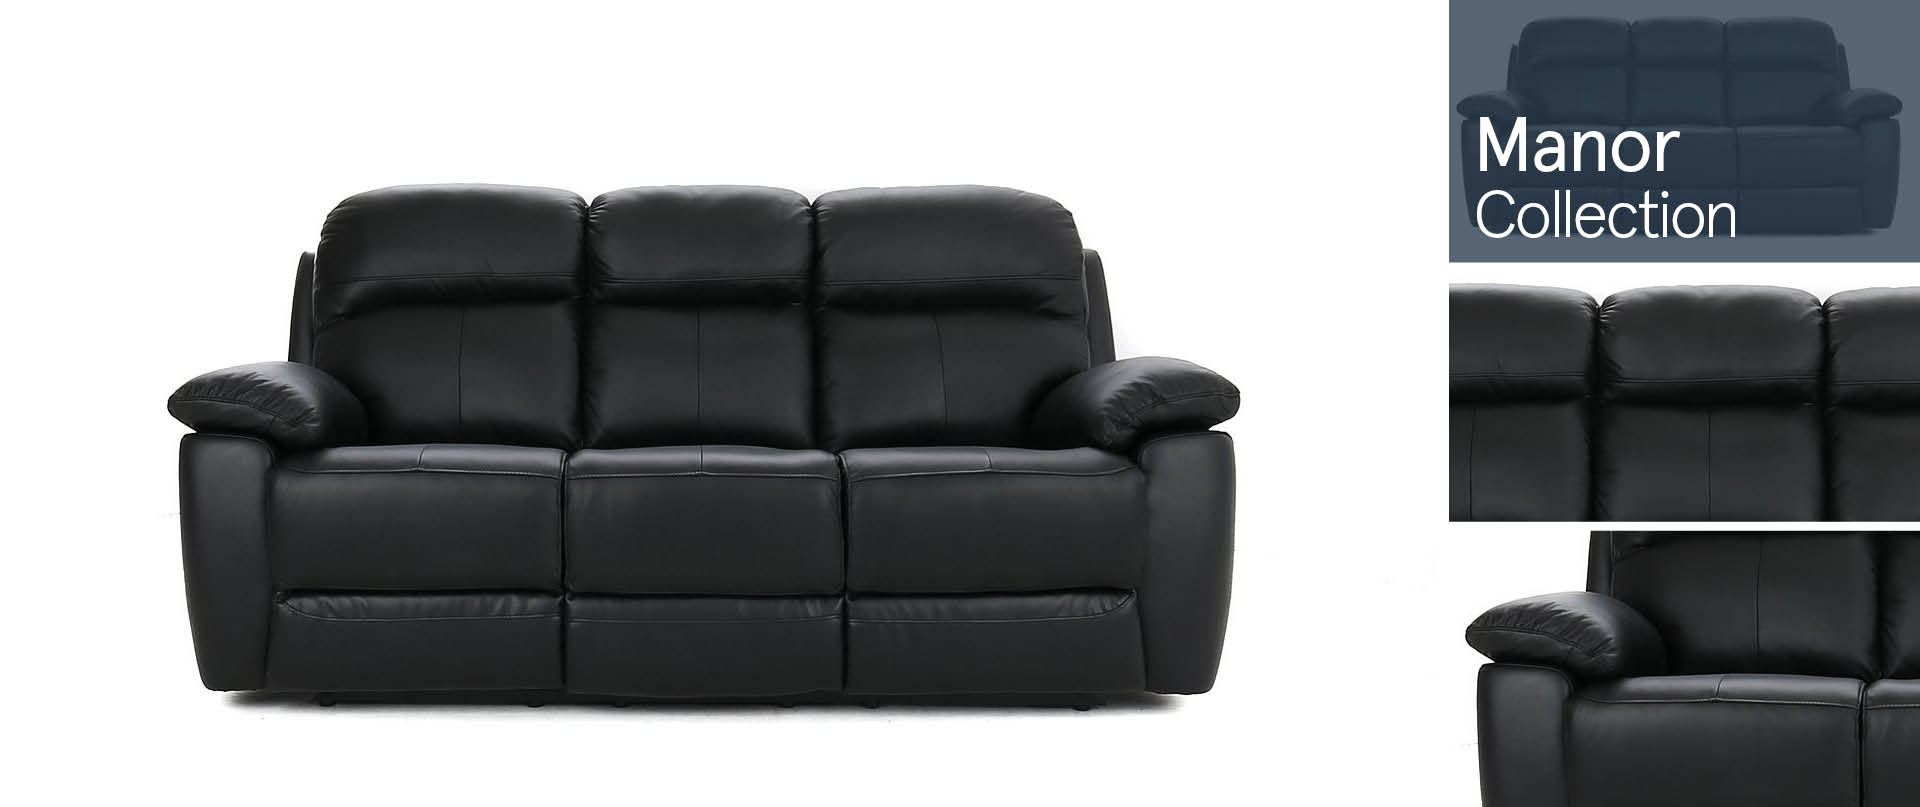 Manor Leather Sofa Ranges